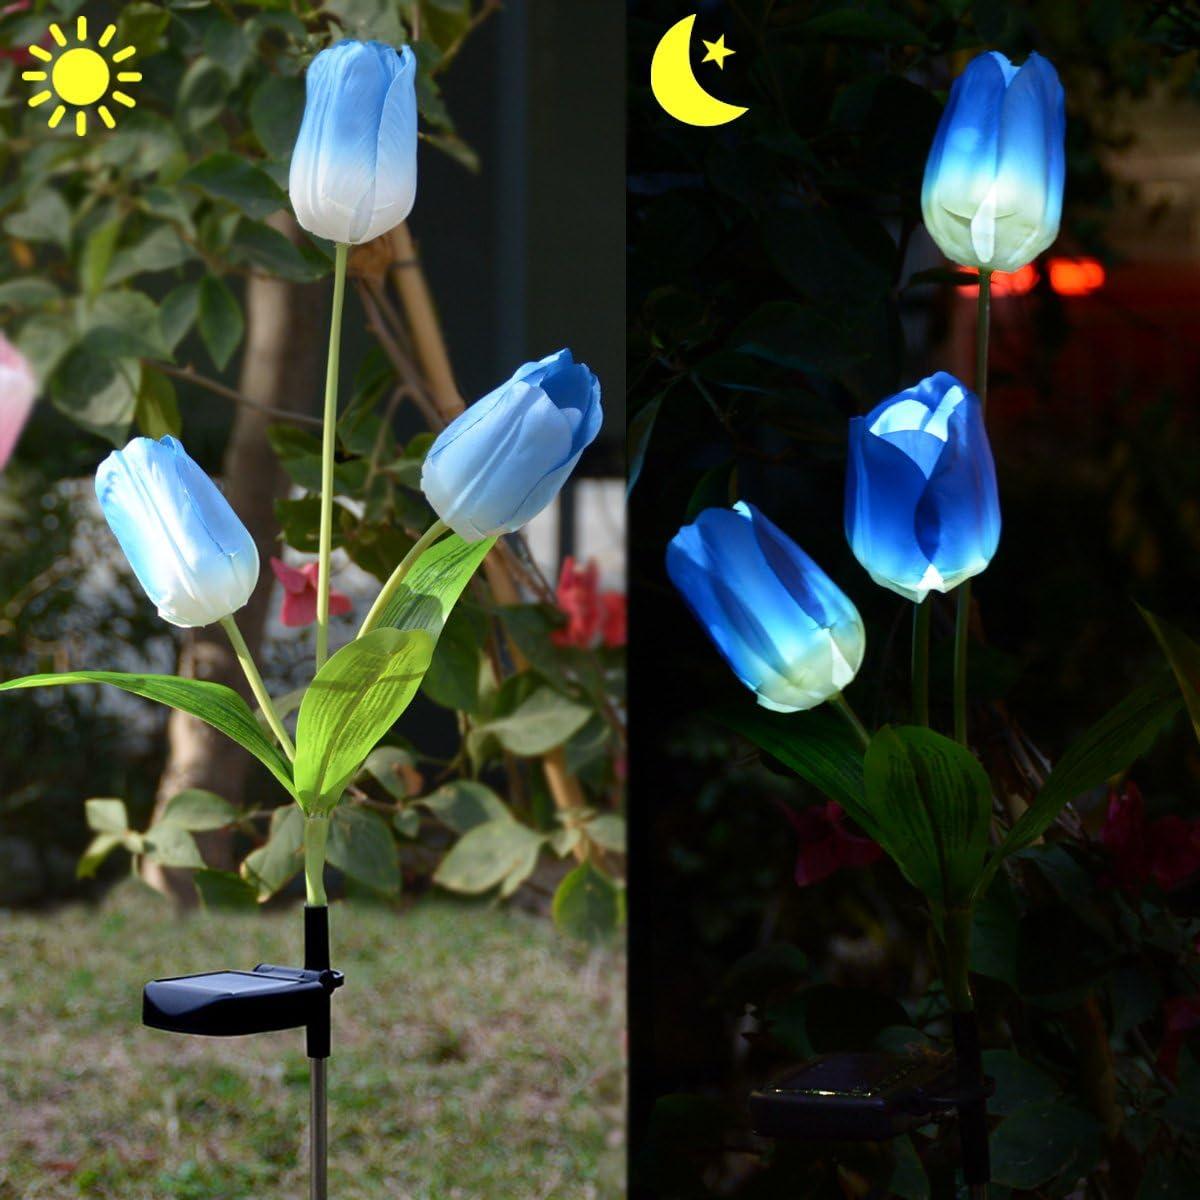 Simulation solar lantern LED 3 flower tulip lamp lights decor for lawn garden